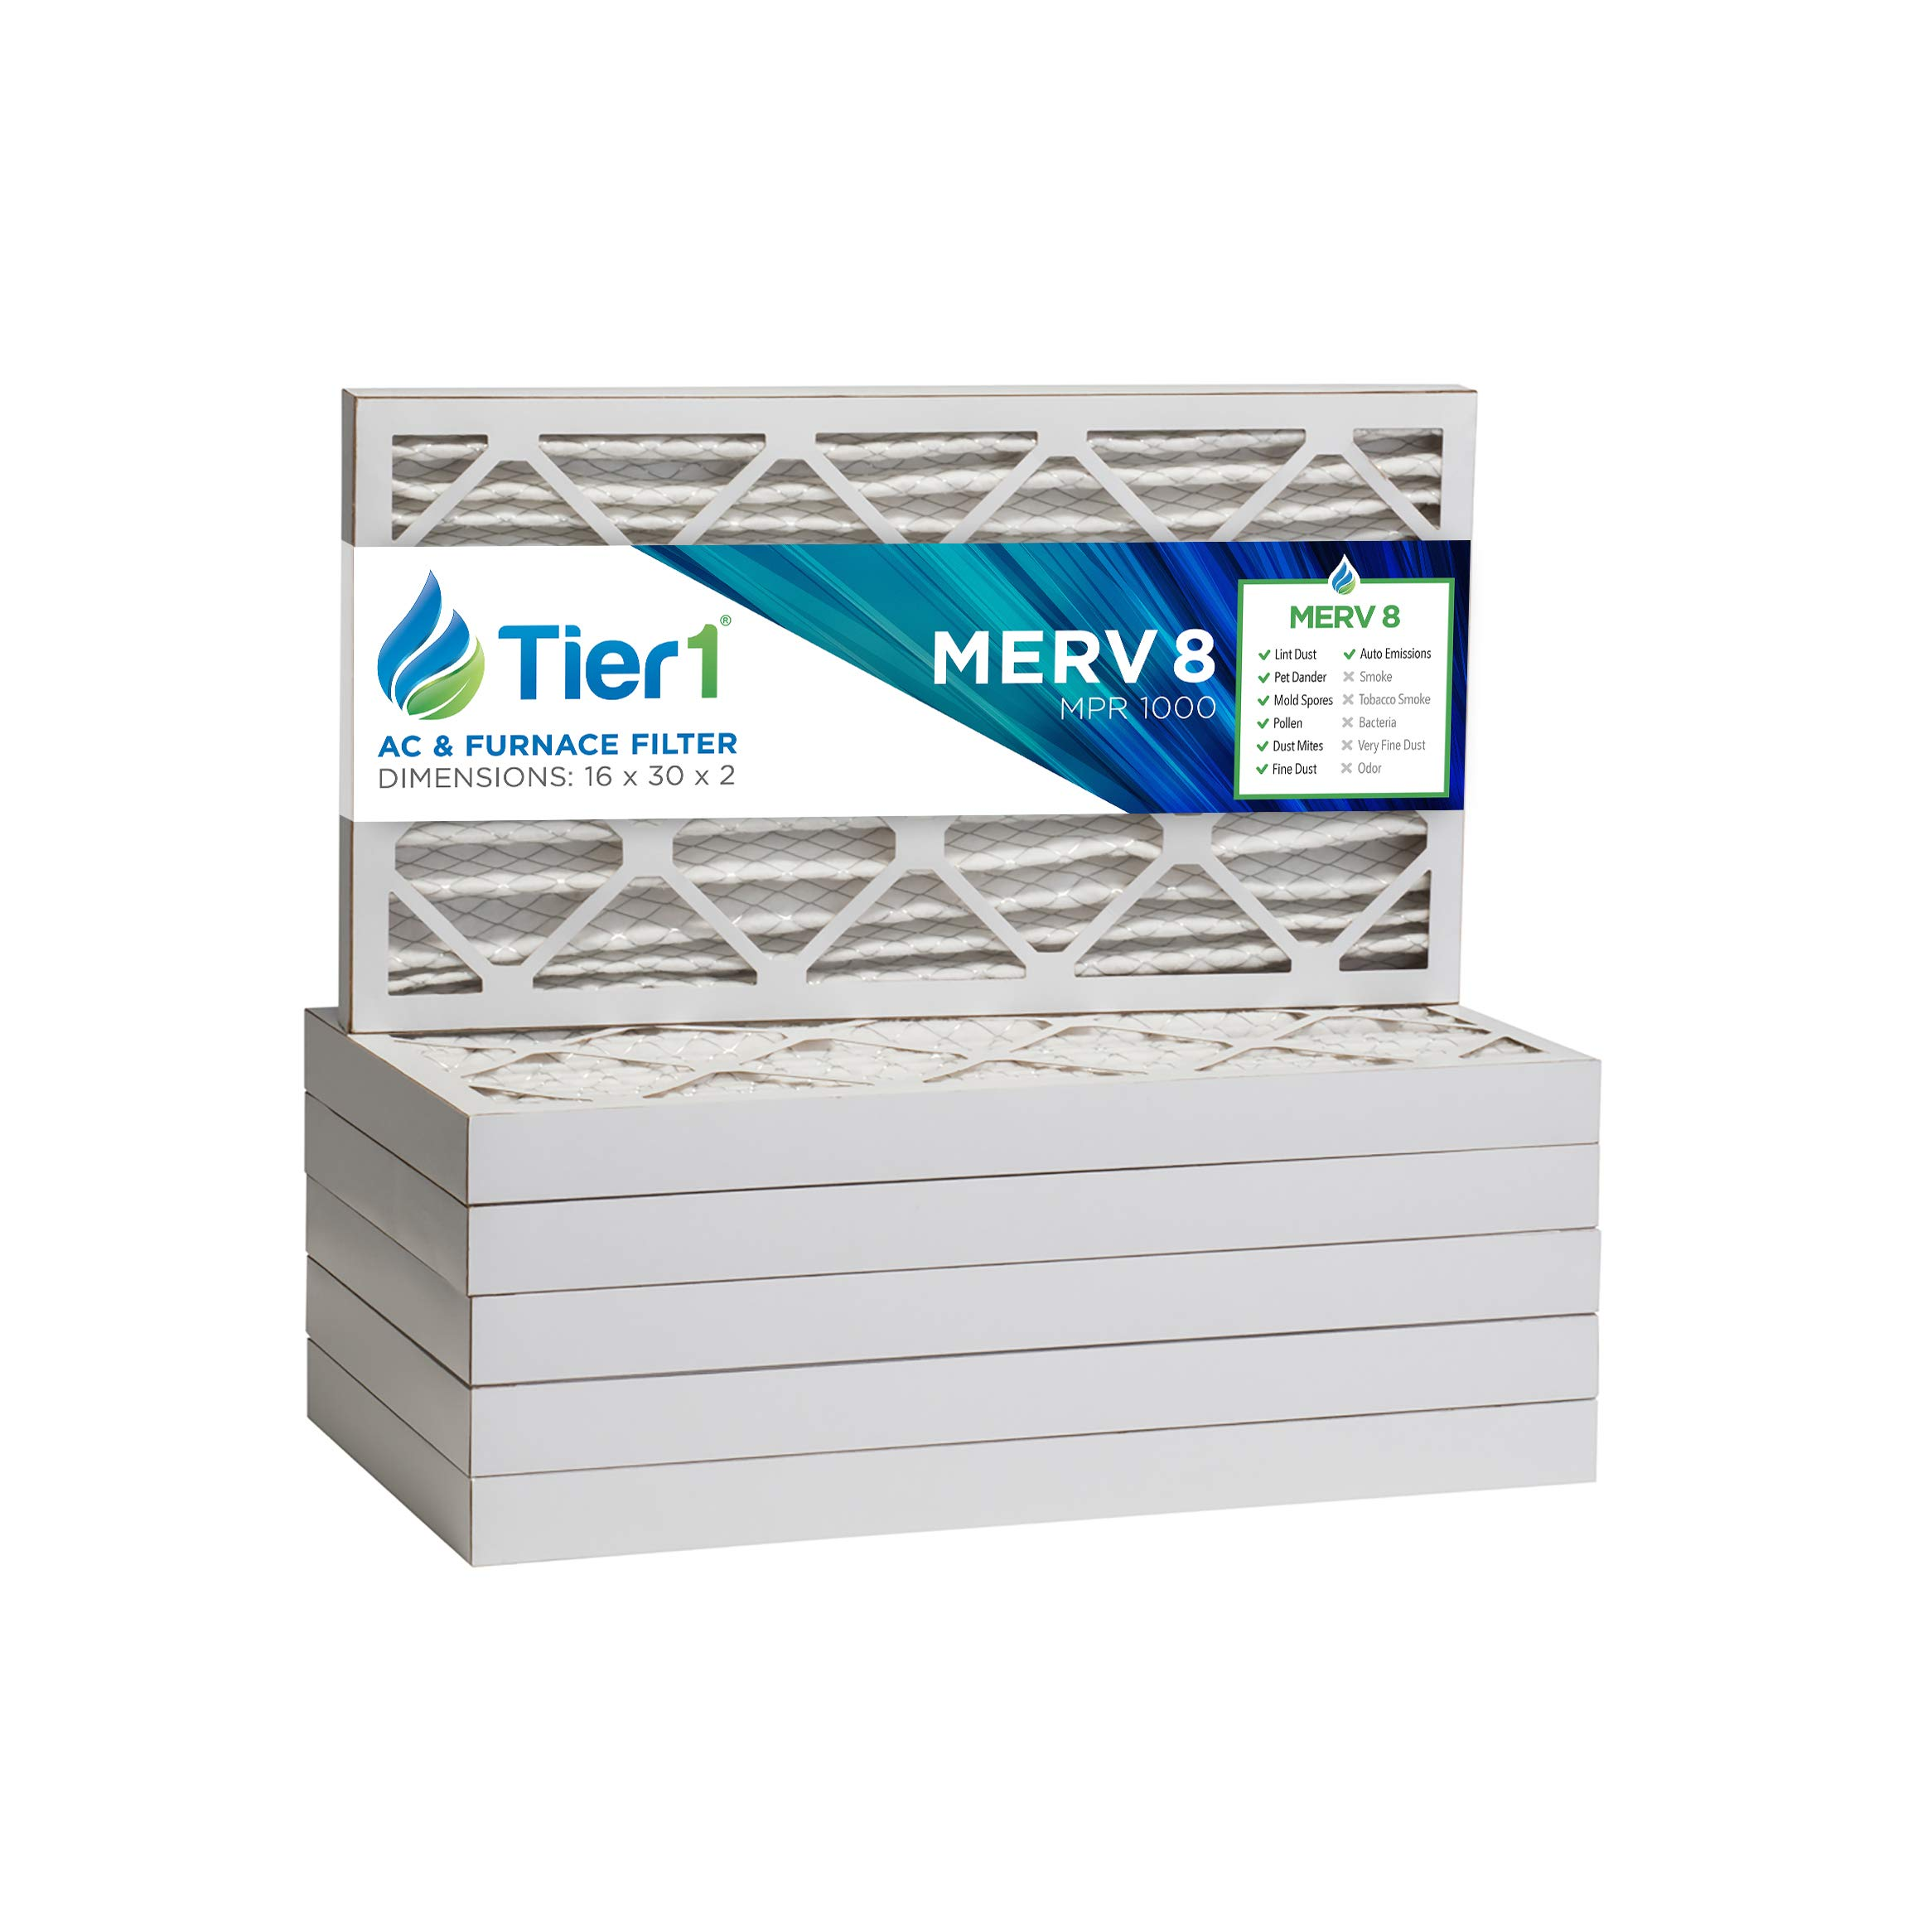 Tier1 10x20x1 Merv 8 Pleated Dust /& Pollen AC Furnace Air Filter 6 Pack